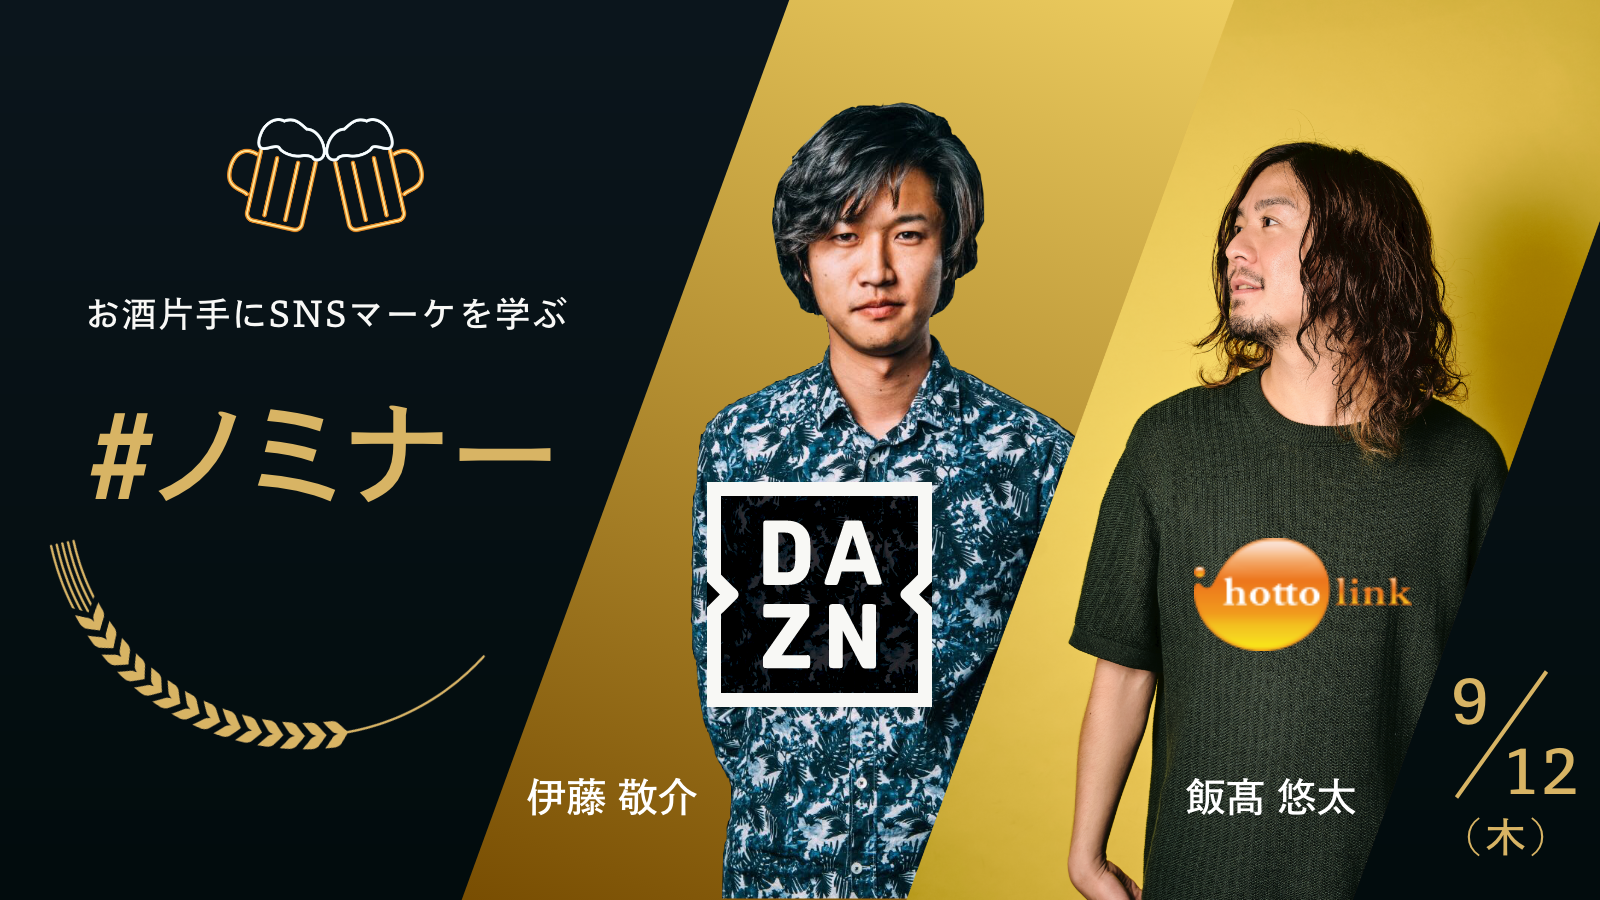 【DAZN・伊藤氏登壇】お酒片手にSNSマーケティングを学ぶ会 #ノミナー